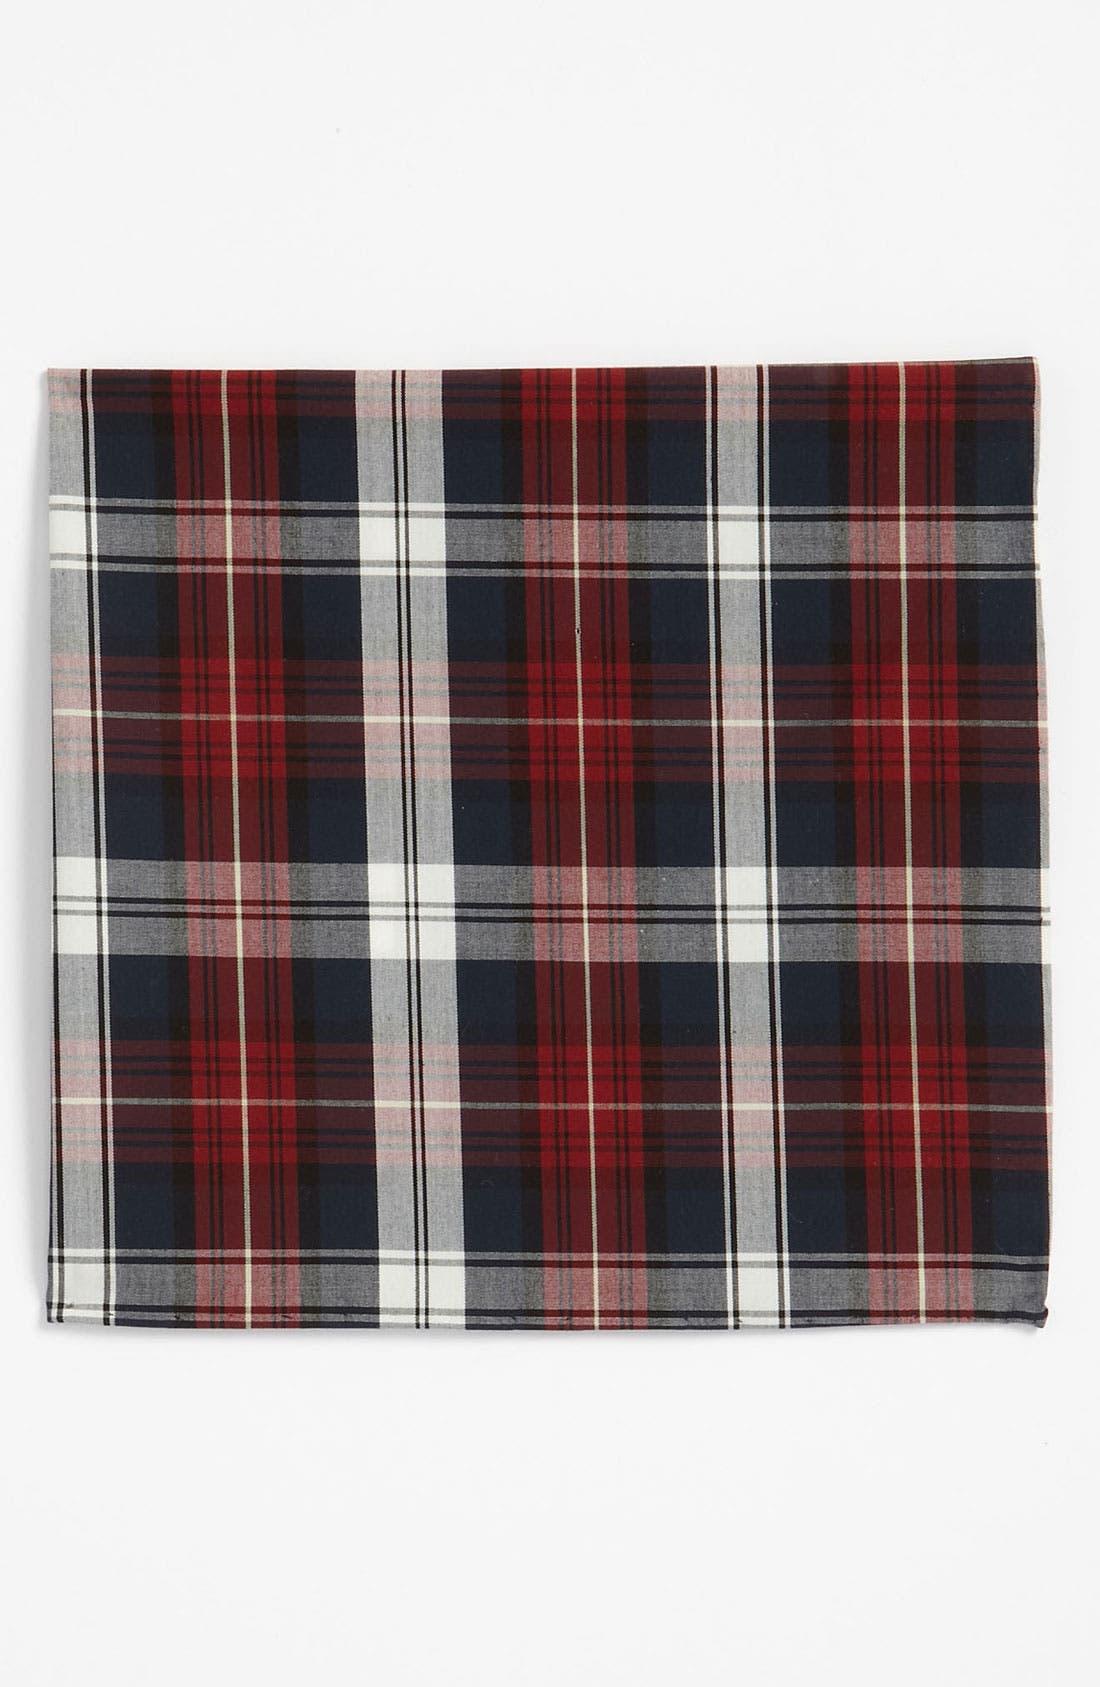 Alternate Image 1 Selected - The Tie Bar Plaid Cotton Pocket Square